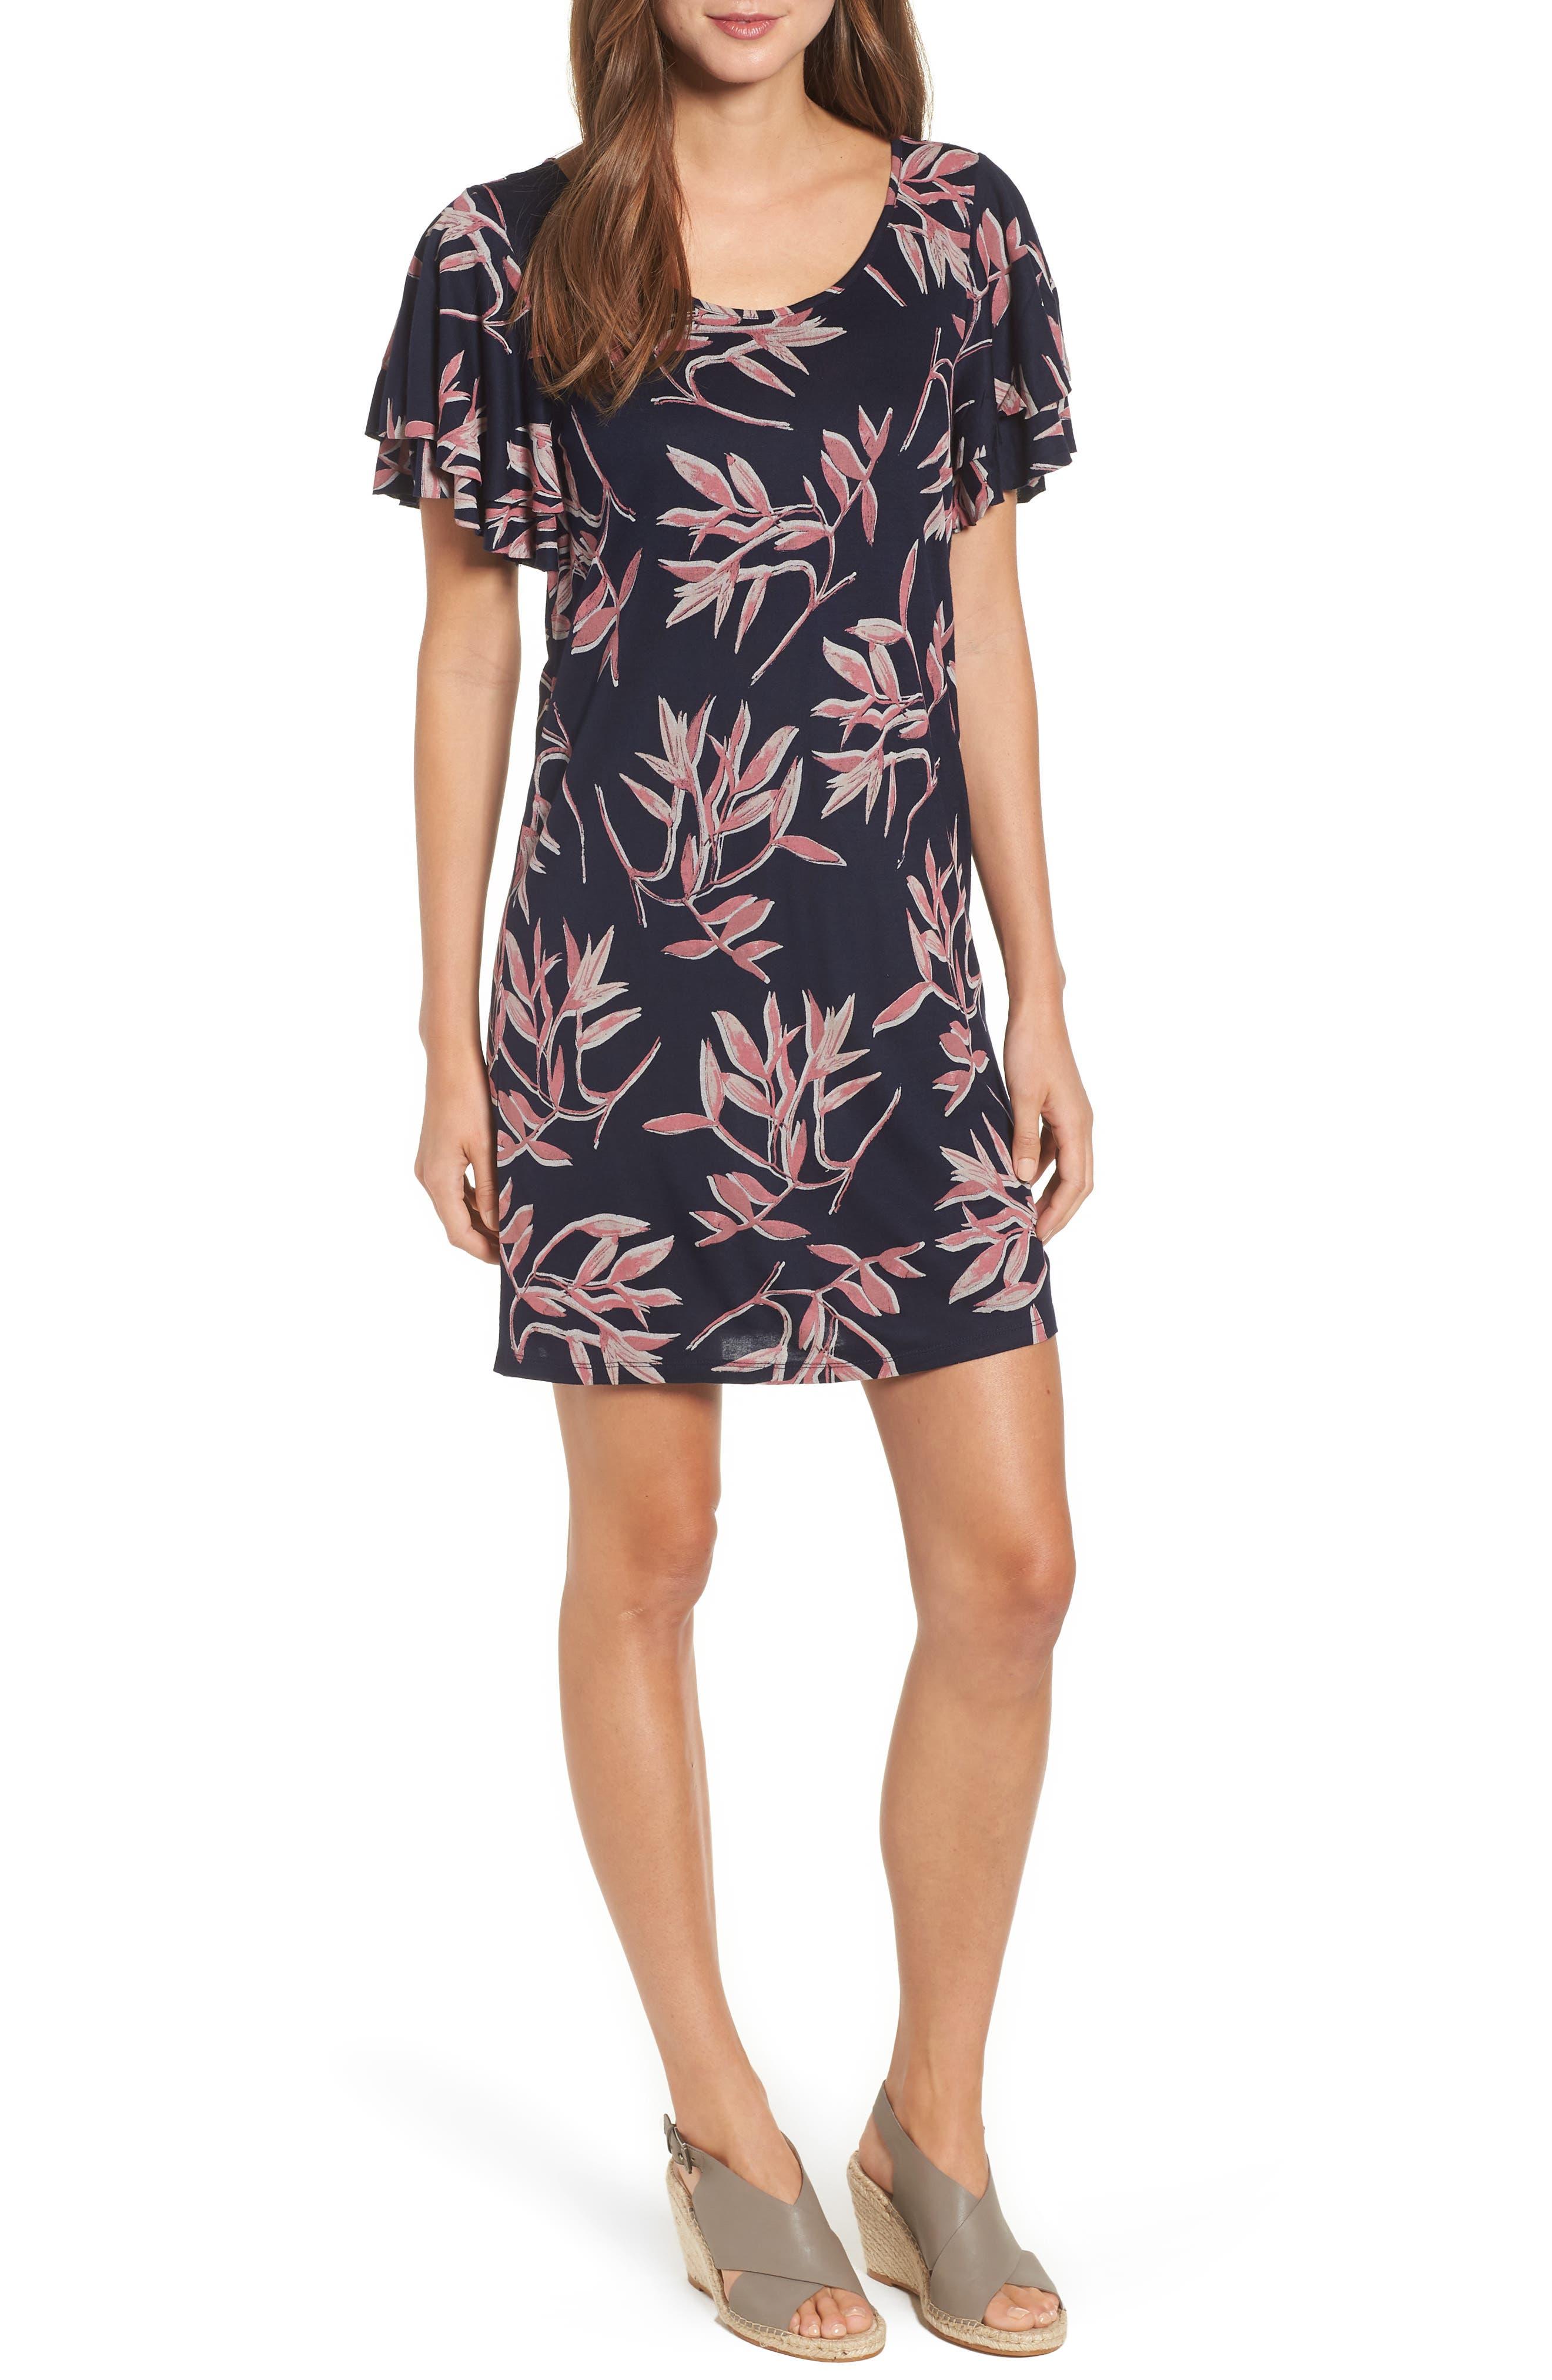 Alternate Image 1 Selected - Lucky Brand Printed Ruffle Sleeve Dress